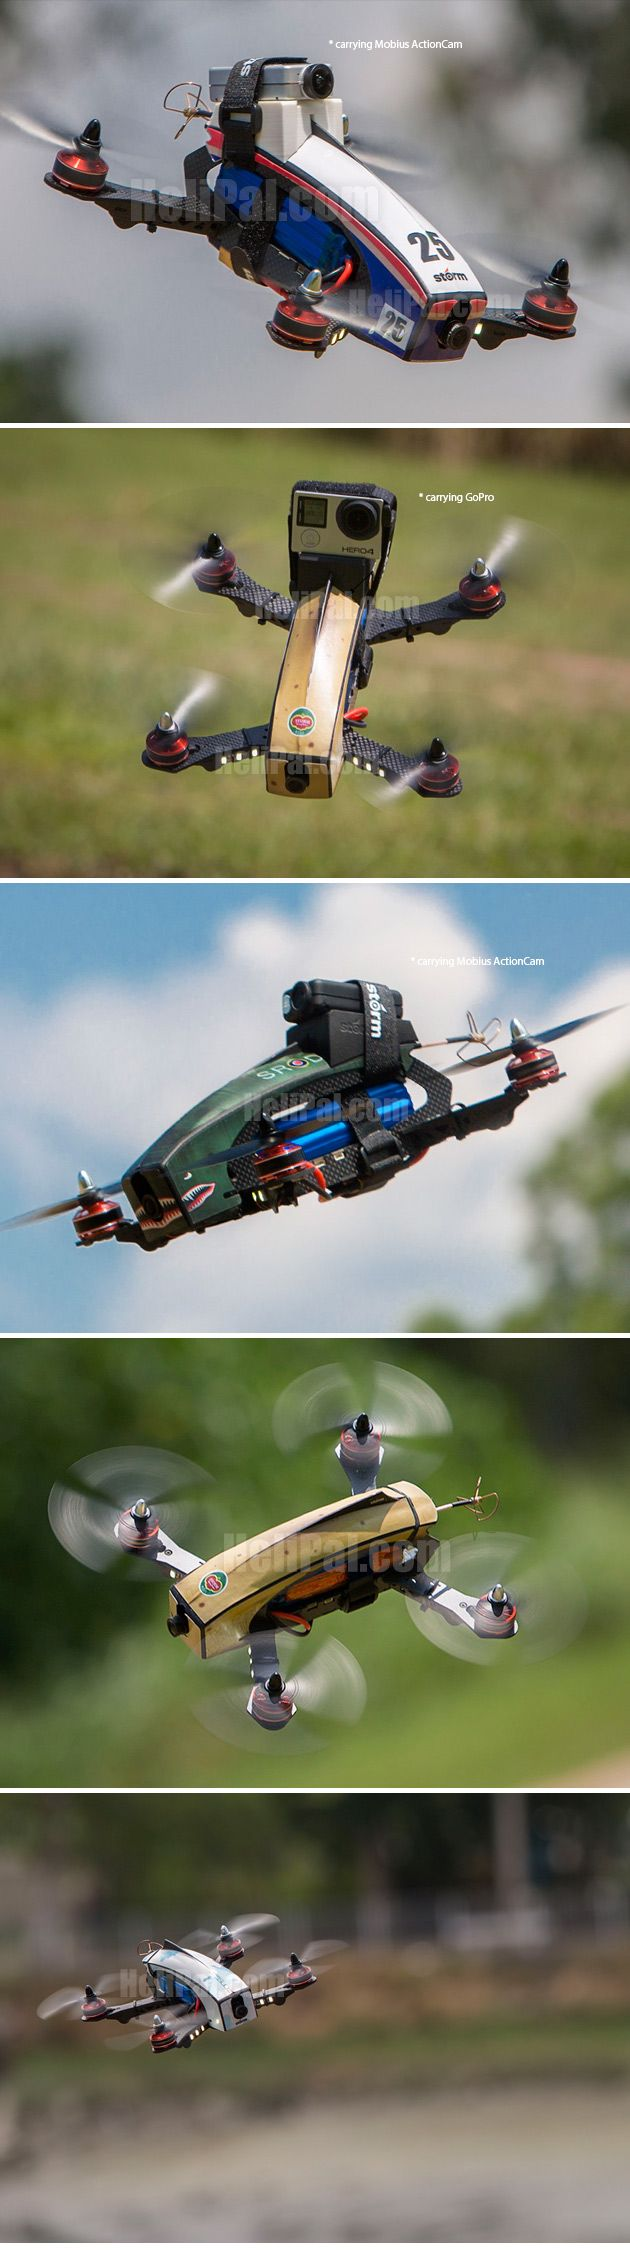 74 best Drones & Quadcopters images on Pinterest | Drones, A drone ...